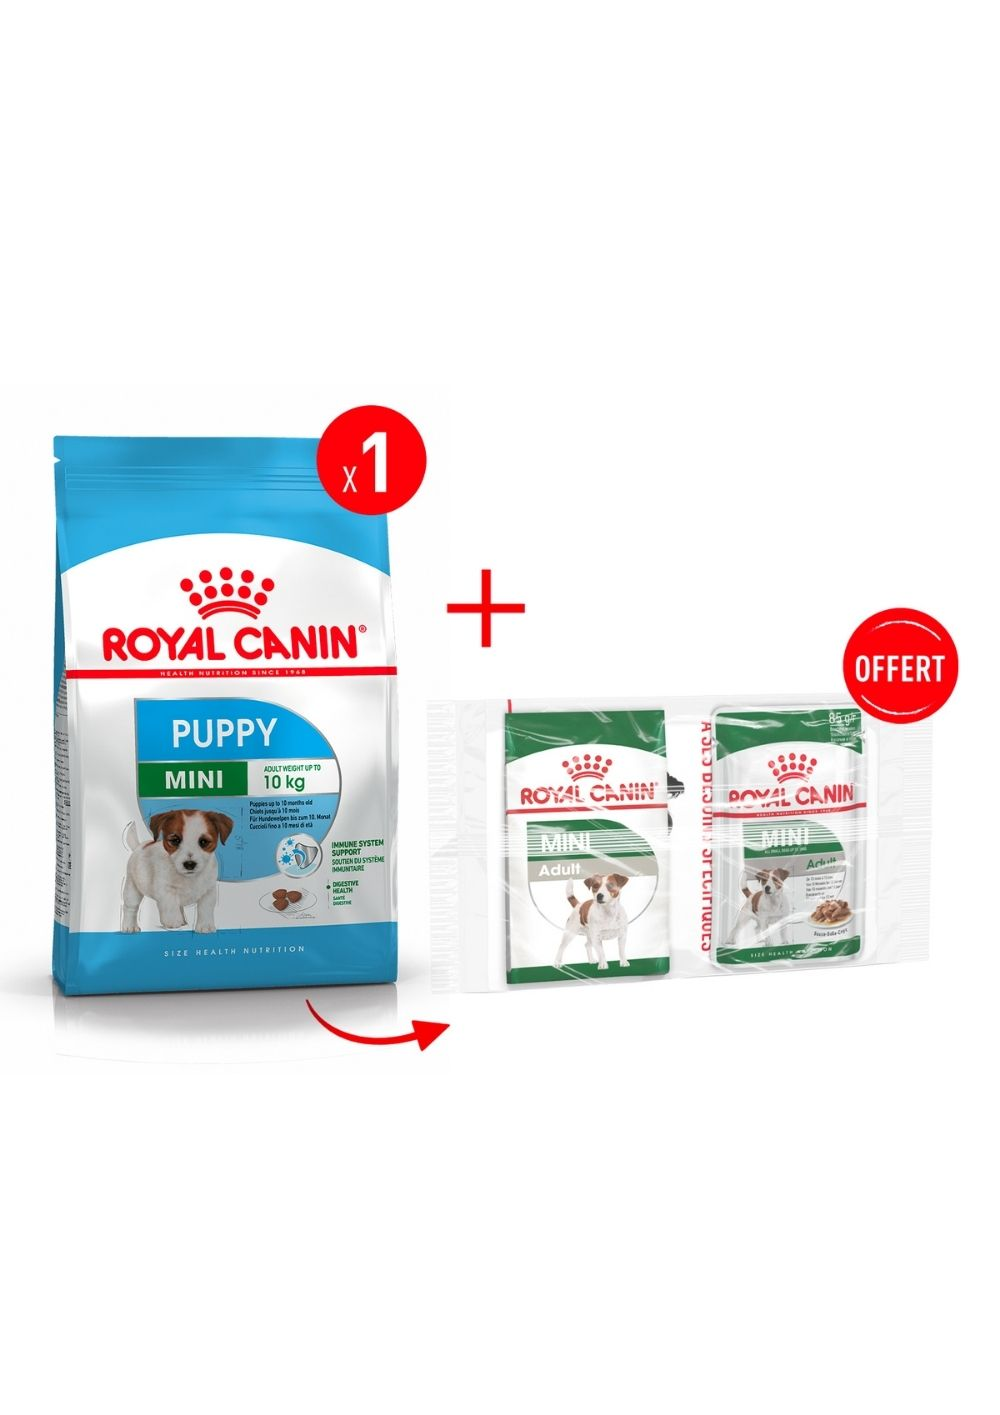 Mini Puppy product image